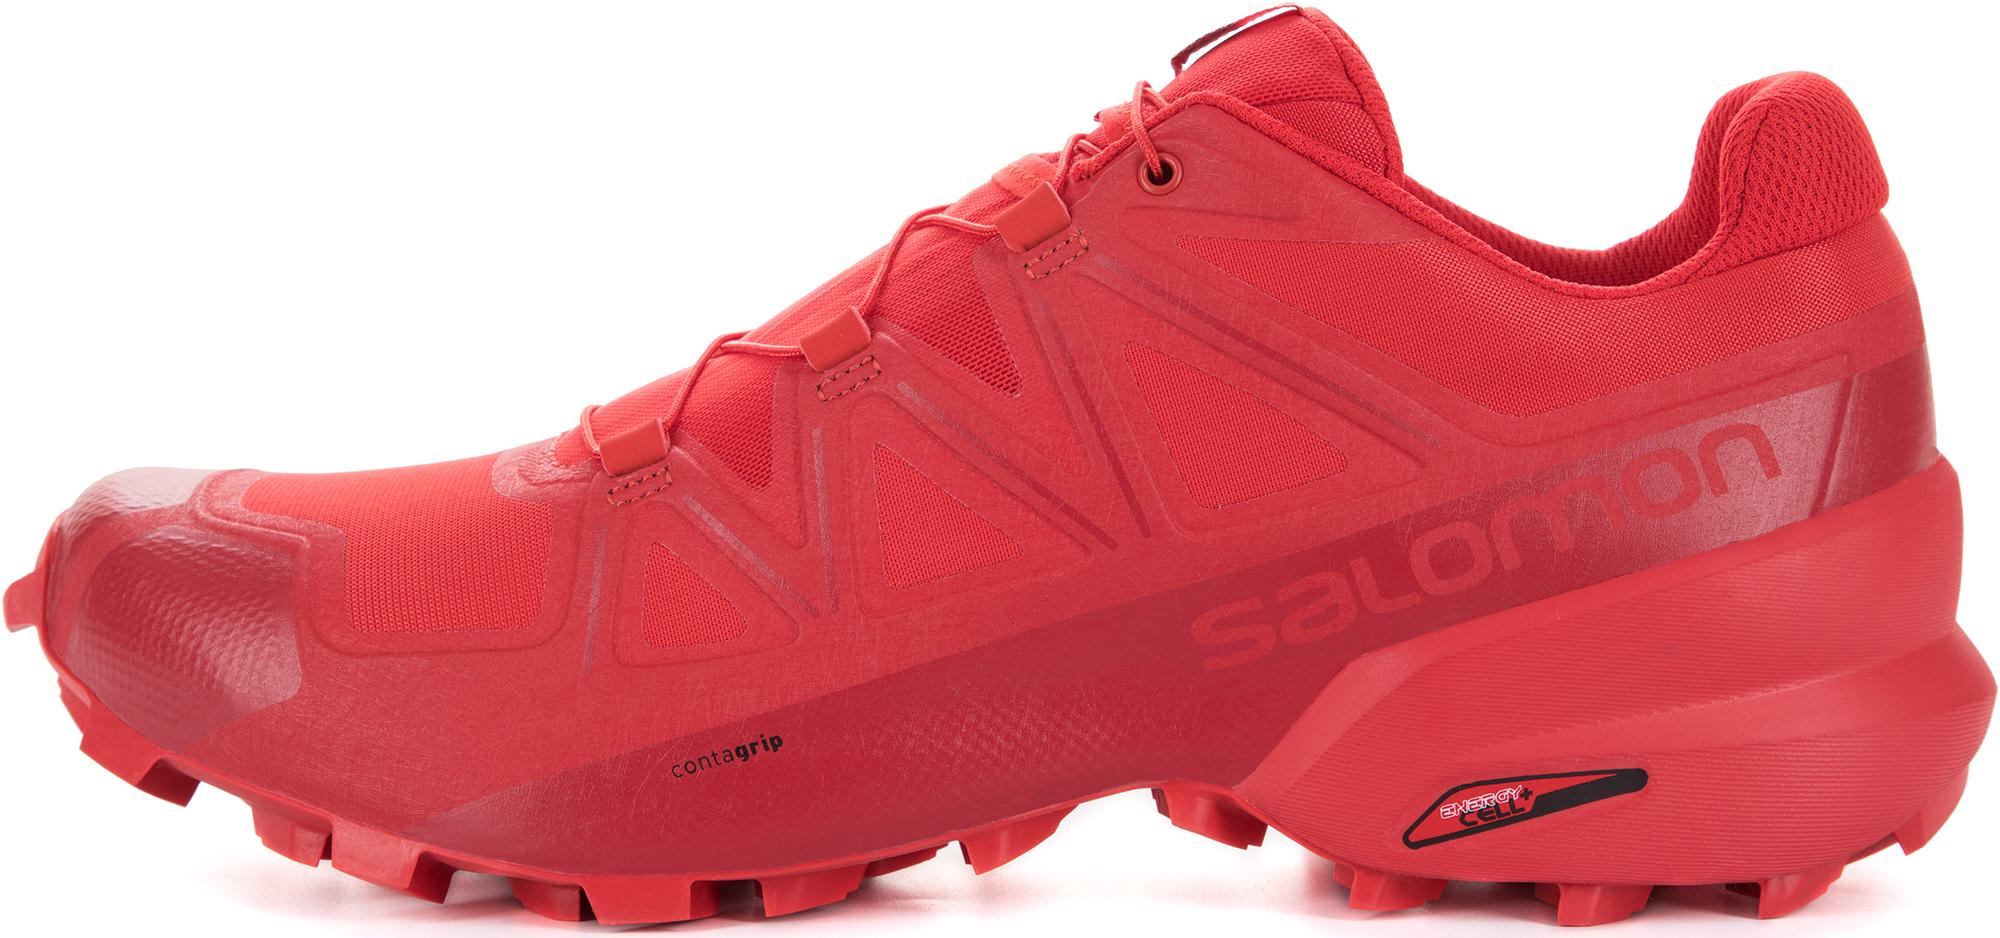 цена на Salomon Кроссовки мужские Salomon Speedcross 5, размер 43